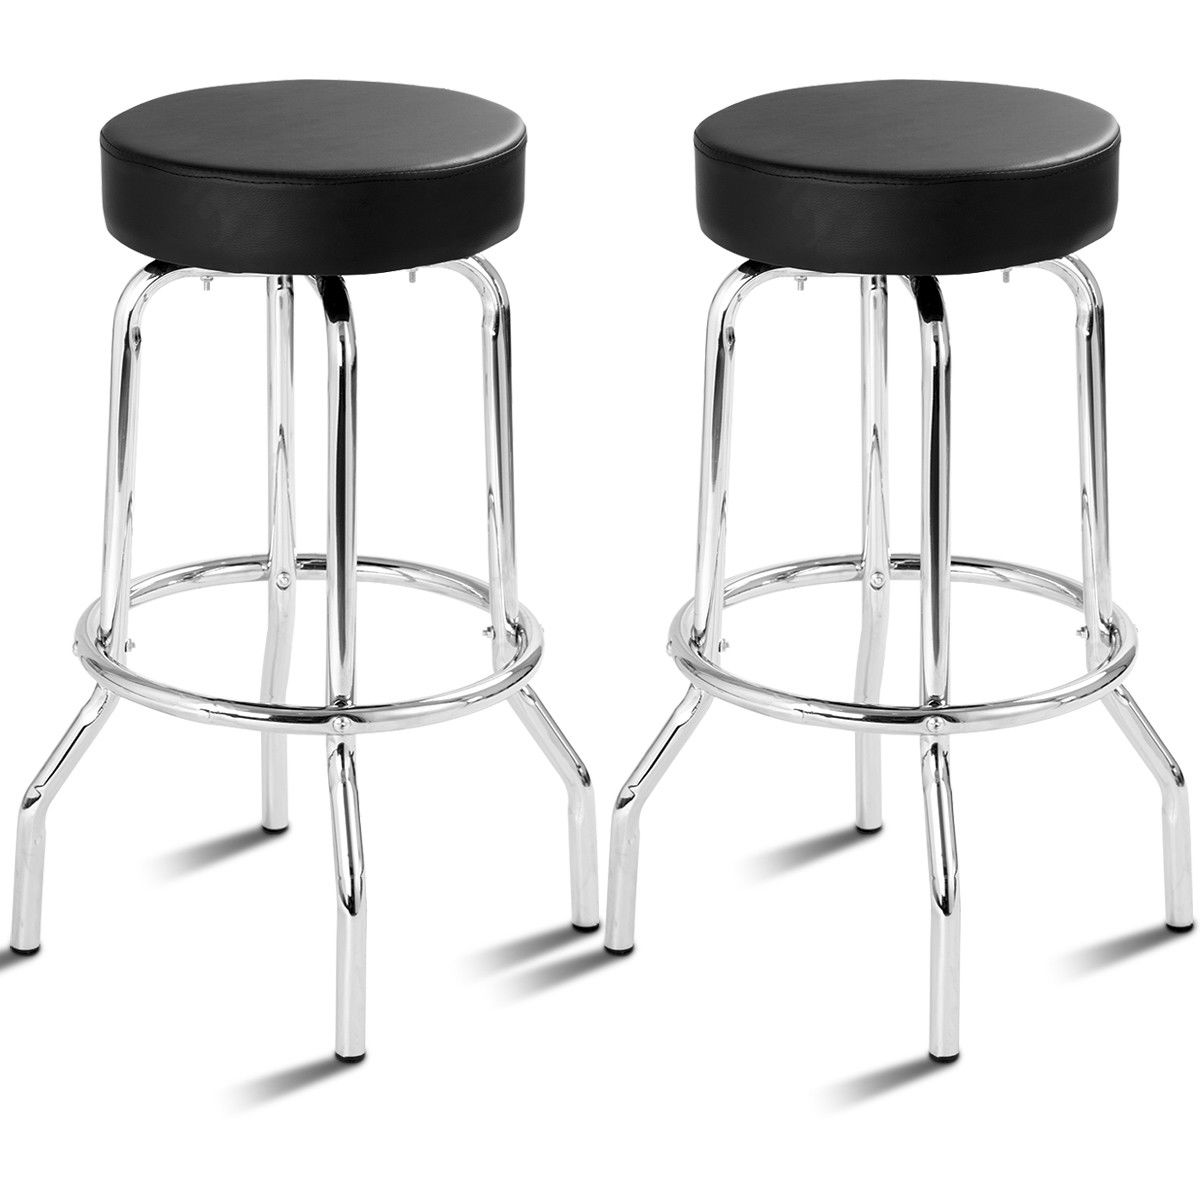 Costway Set Of 2 Bar Stools PU Leather Round Seat Backless Swivel Pub Kitchen Furniture